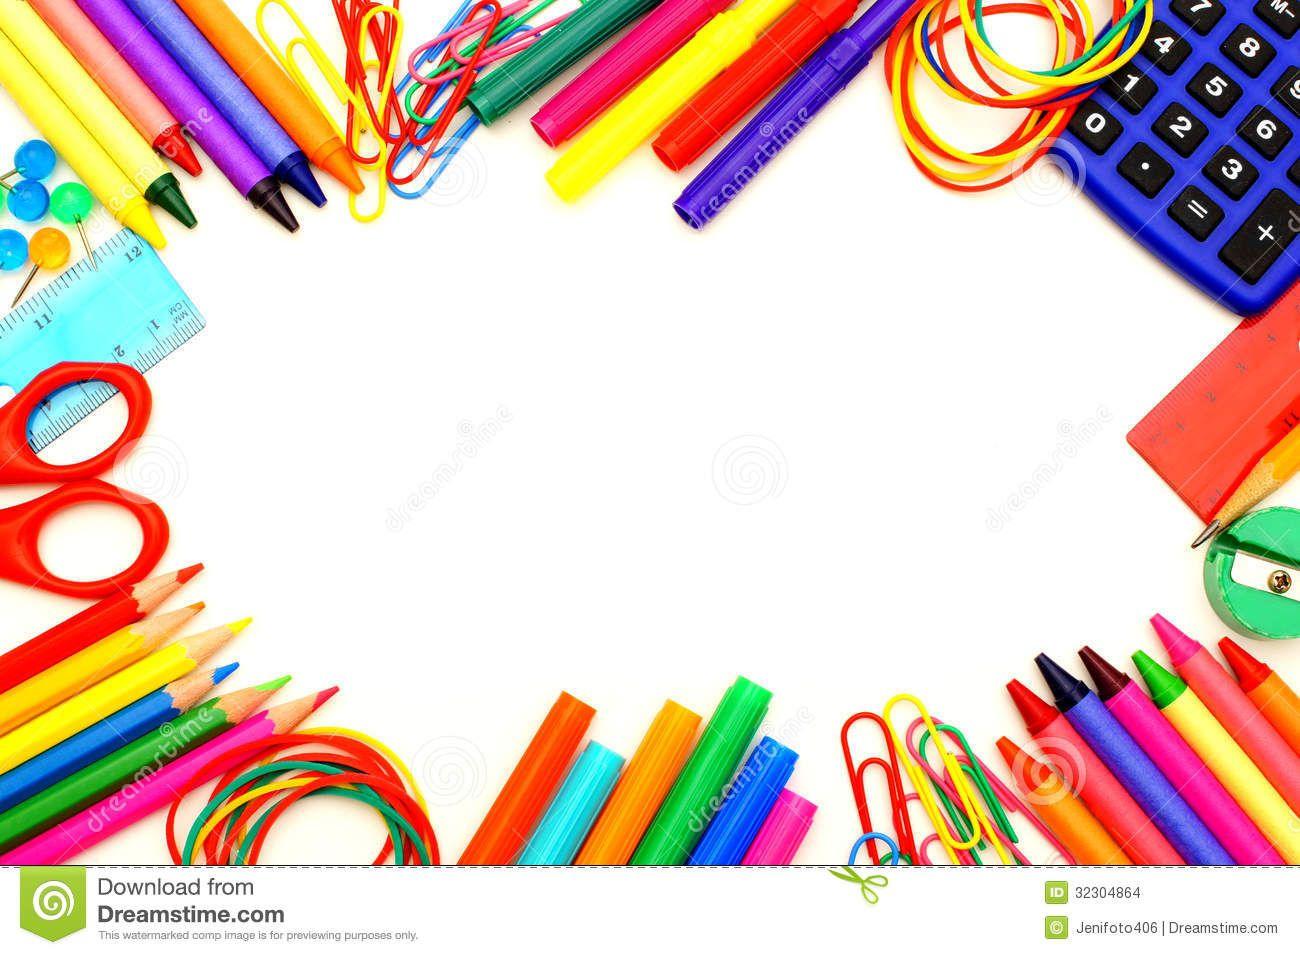 Art suppliesborder clipart png royalty free stock School Supplies Border Clipart   Free download best School Supplies ... png royalty free stock